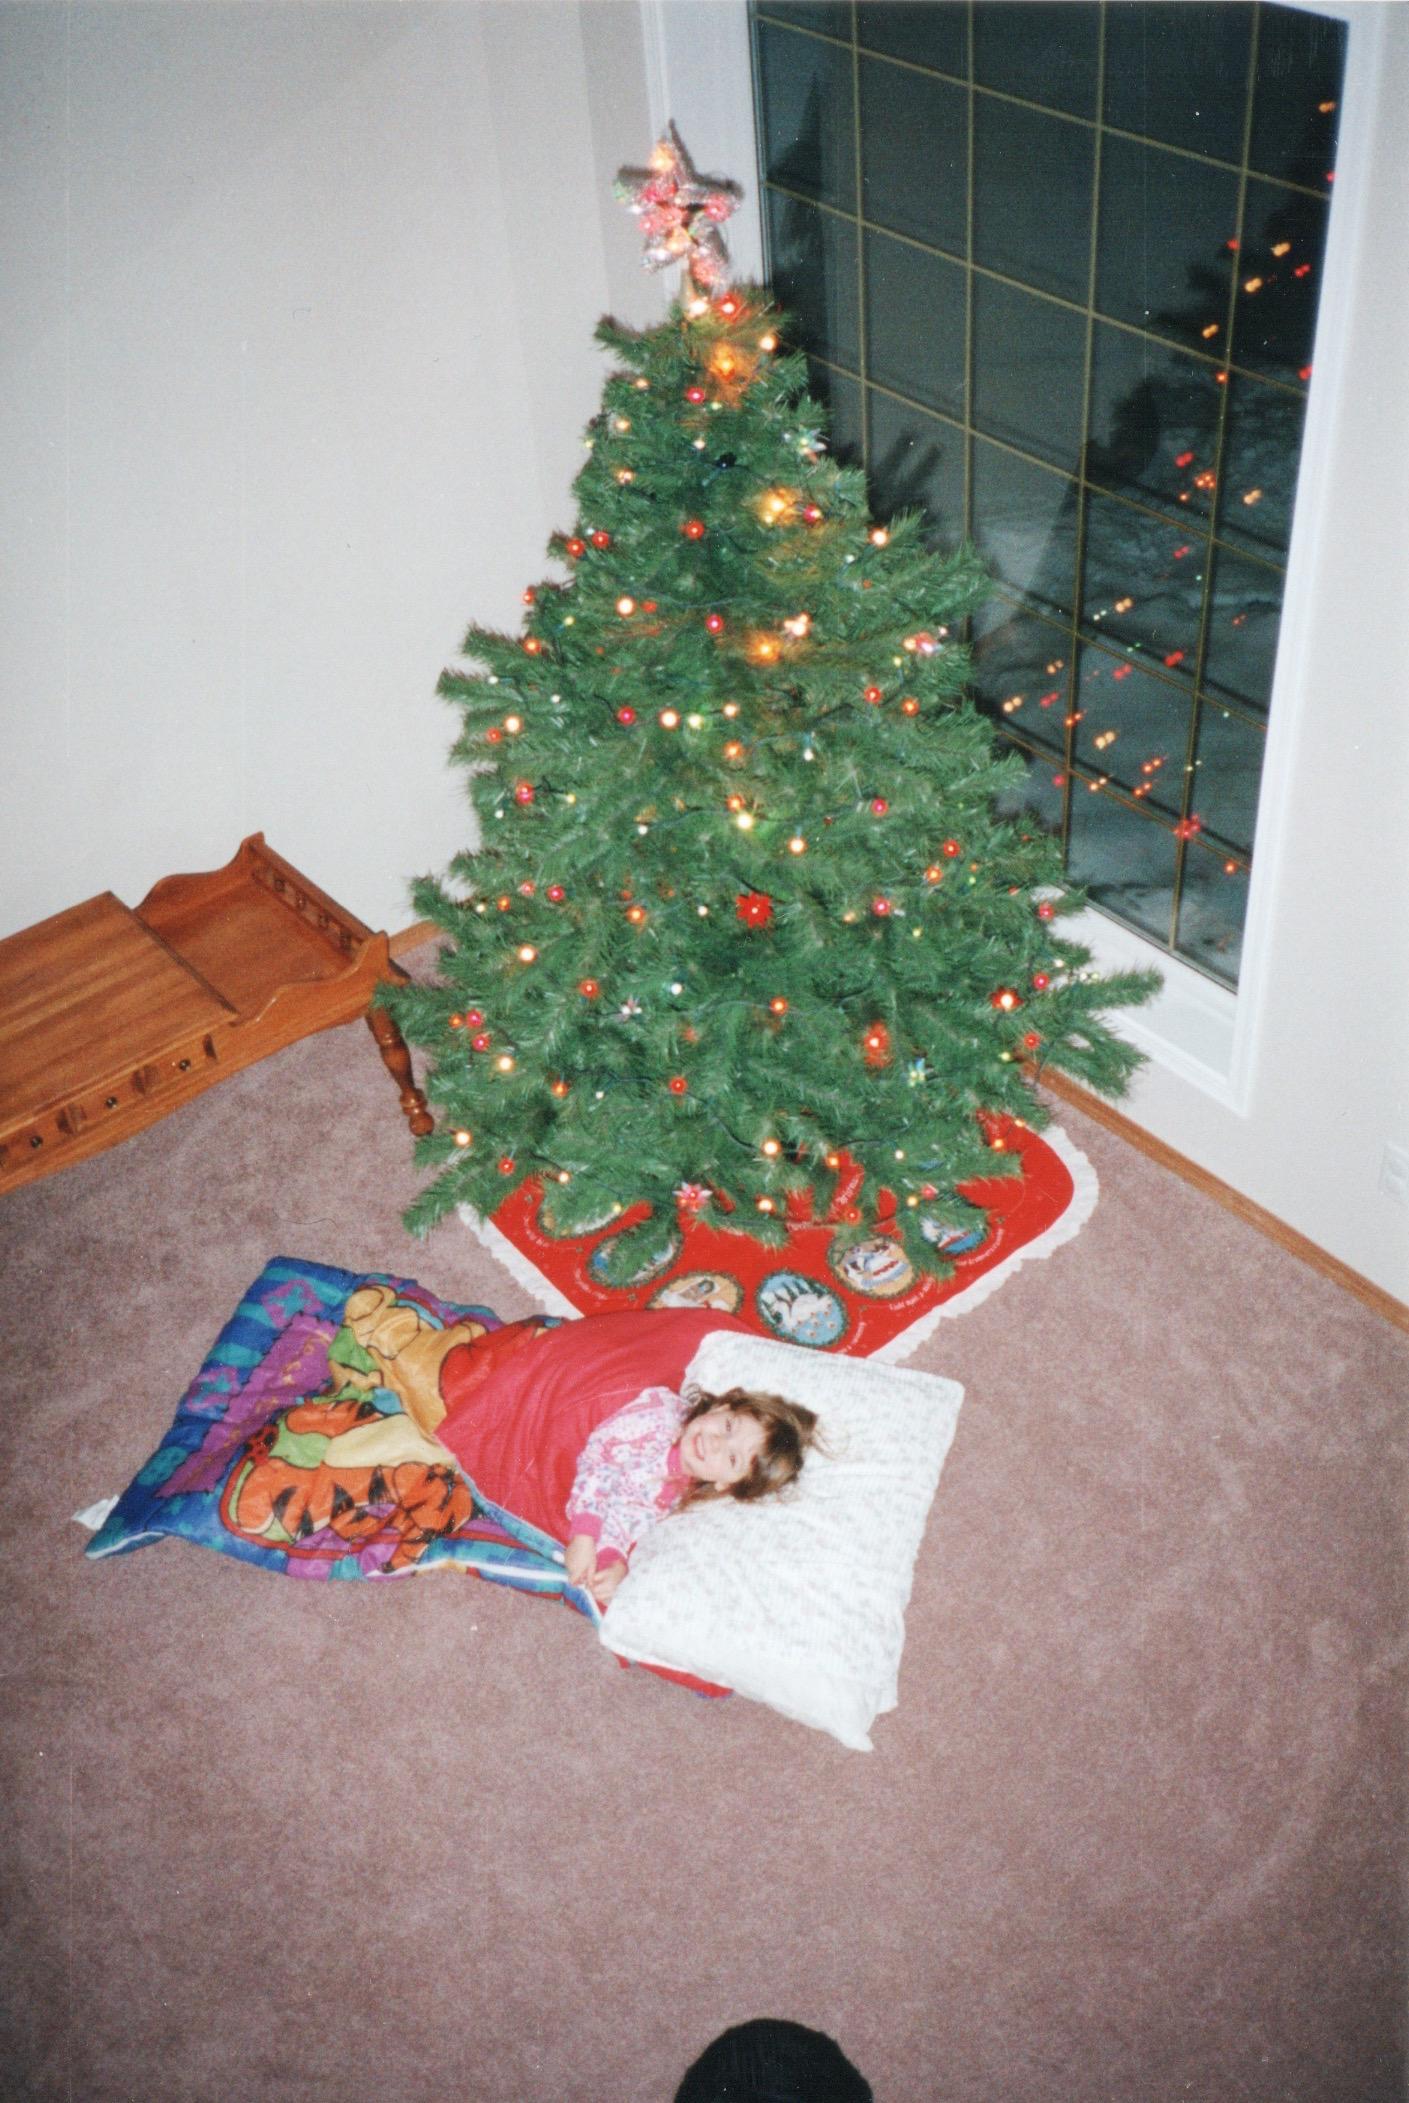 Nyla Free Designs, Christmas Traditions, Calgary Interior Designer